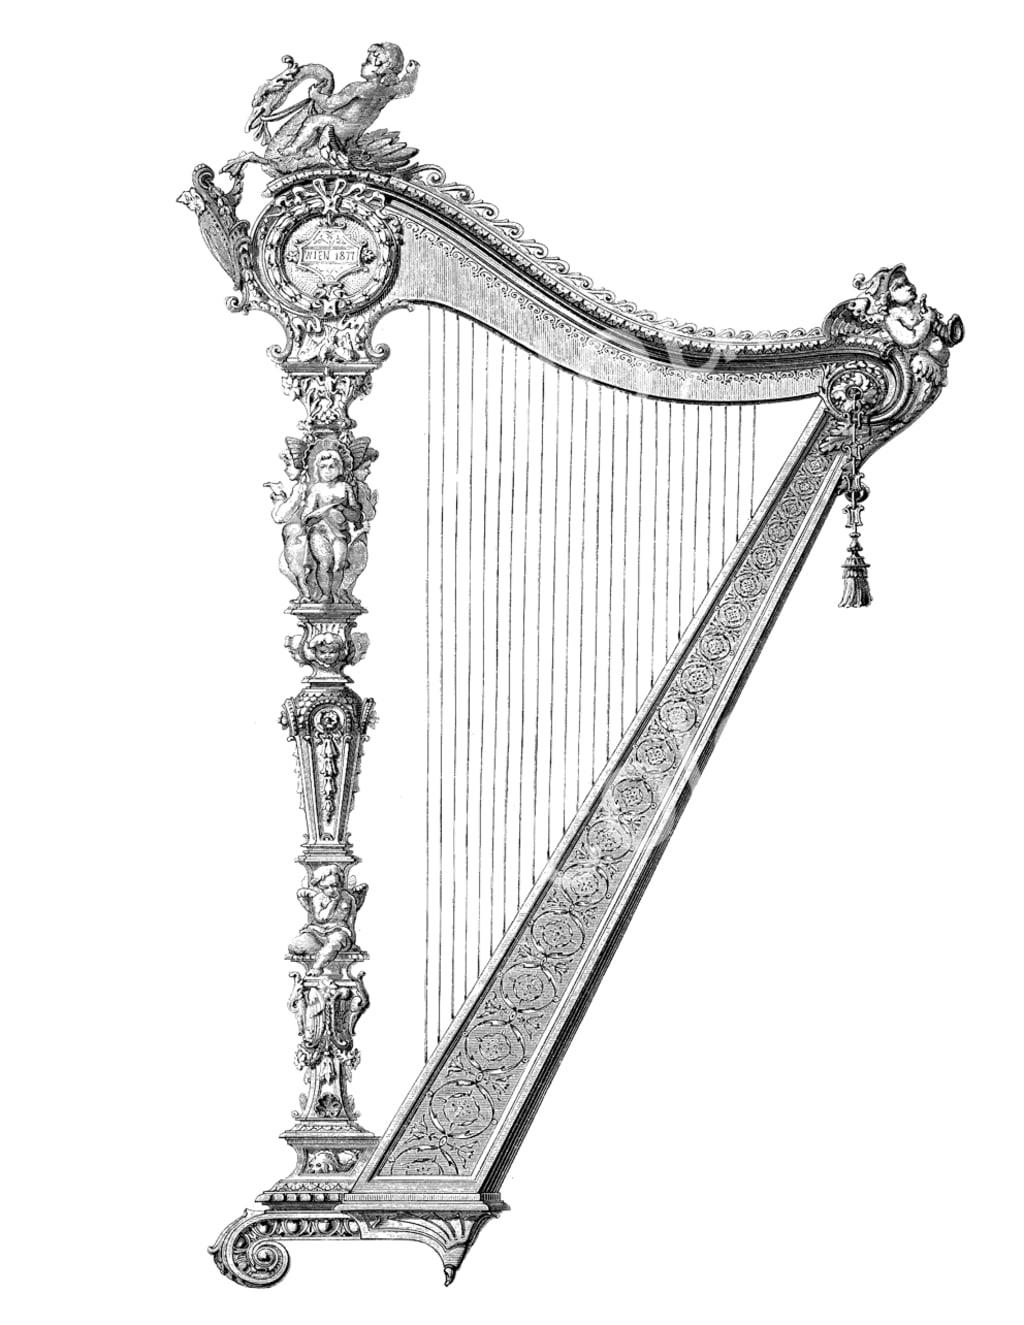 She's Darryl's Harp